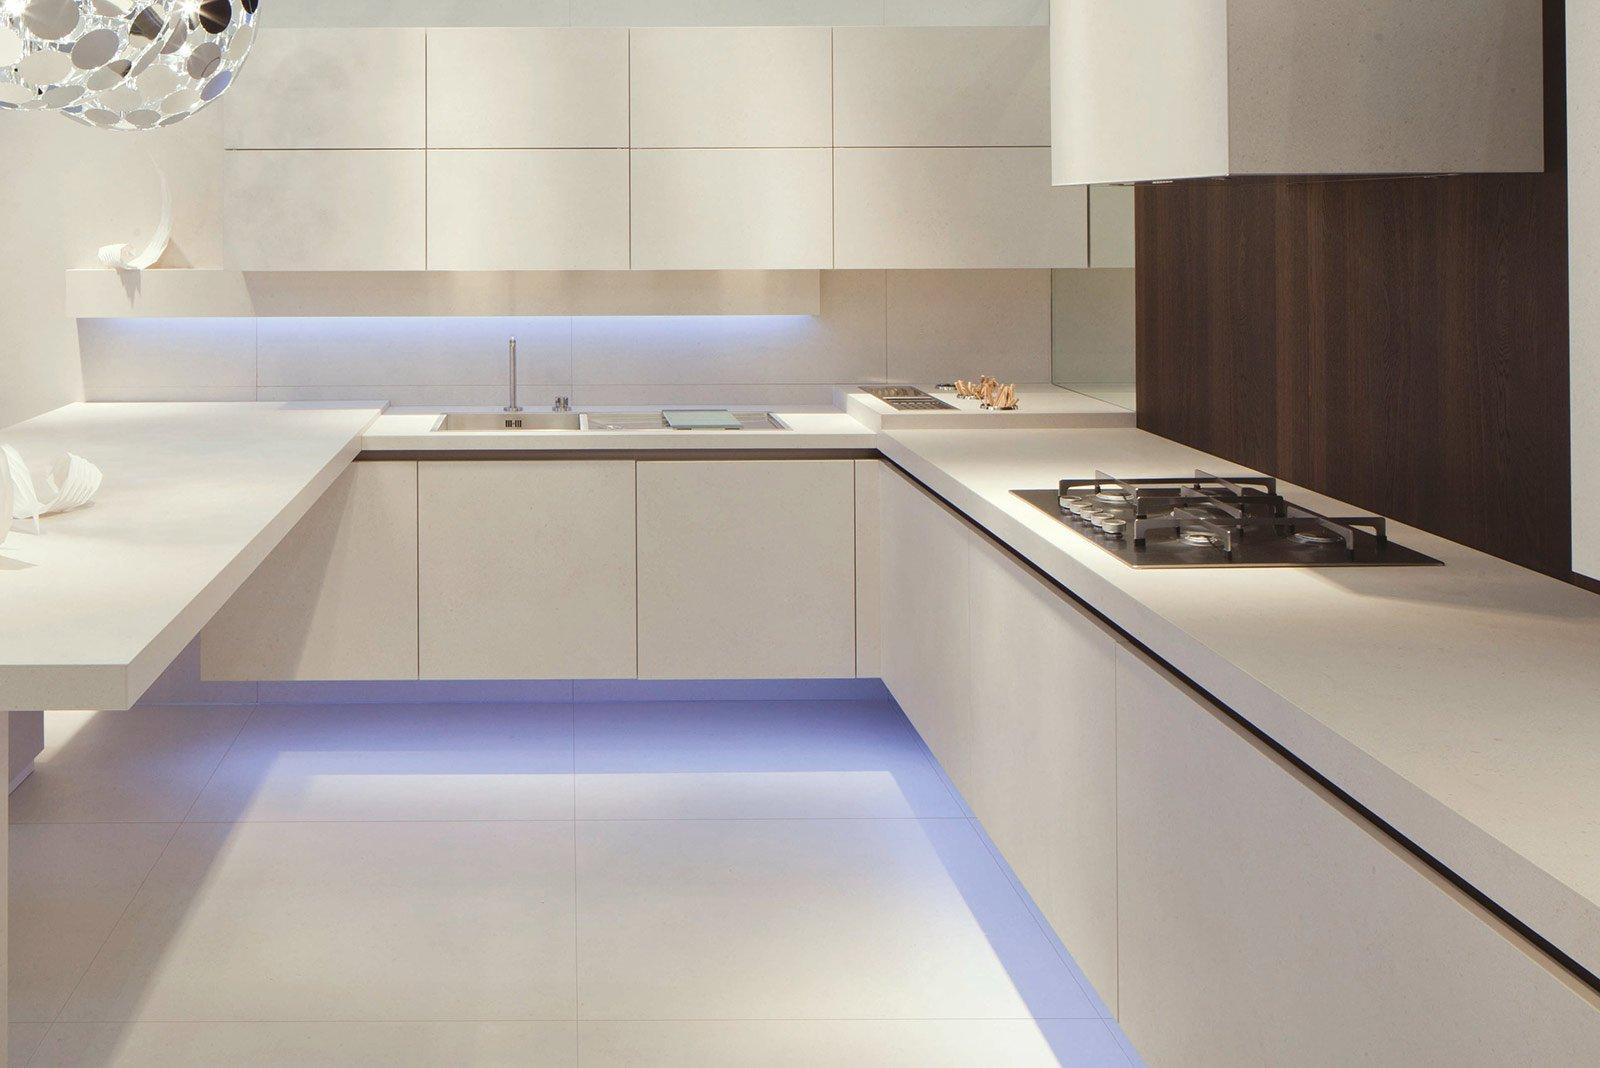 La cucina Etherna di Arrital armonizza arredo e ambiente ...